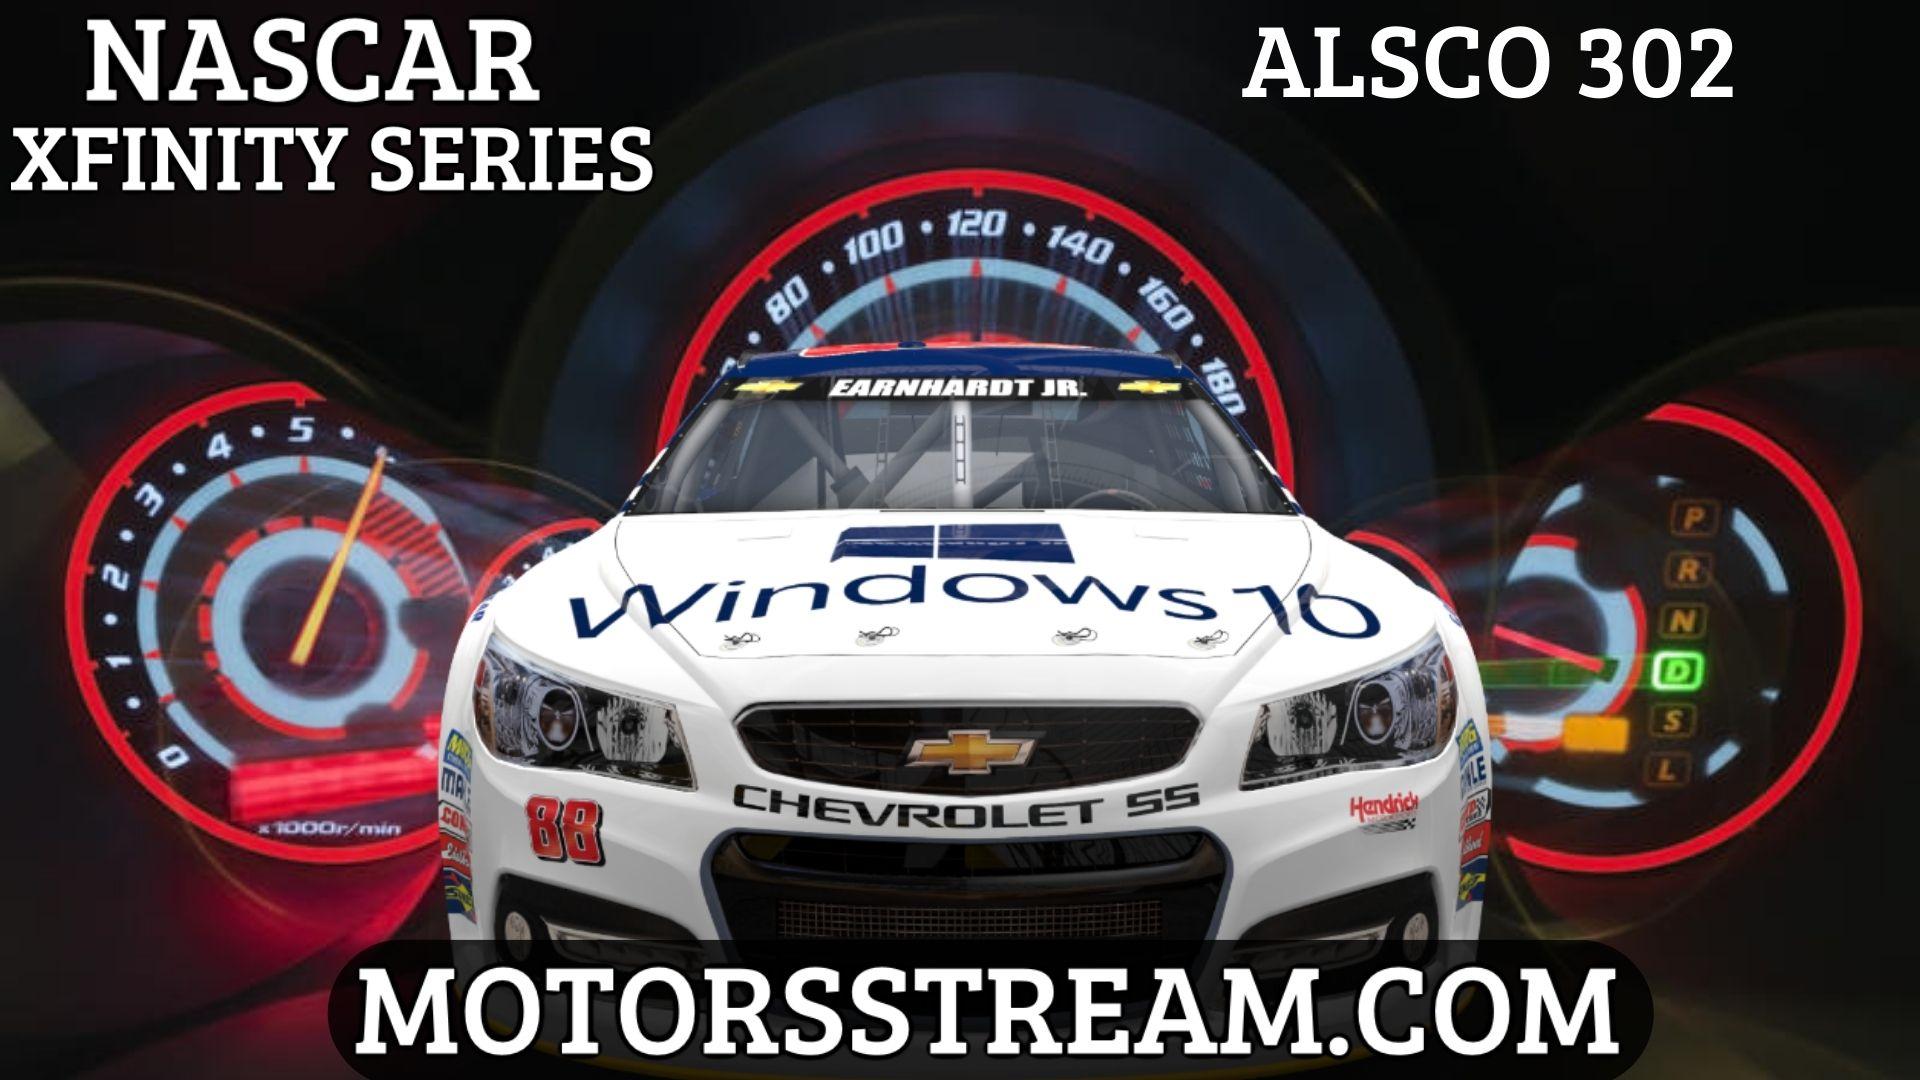 Alsco 302 Live Stream | NASCAR Xfinity 2021